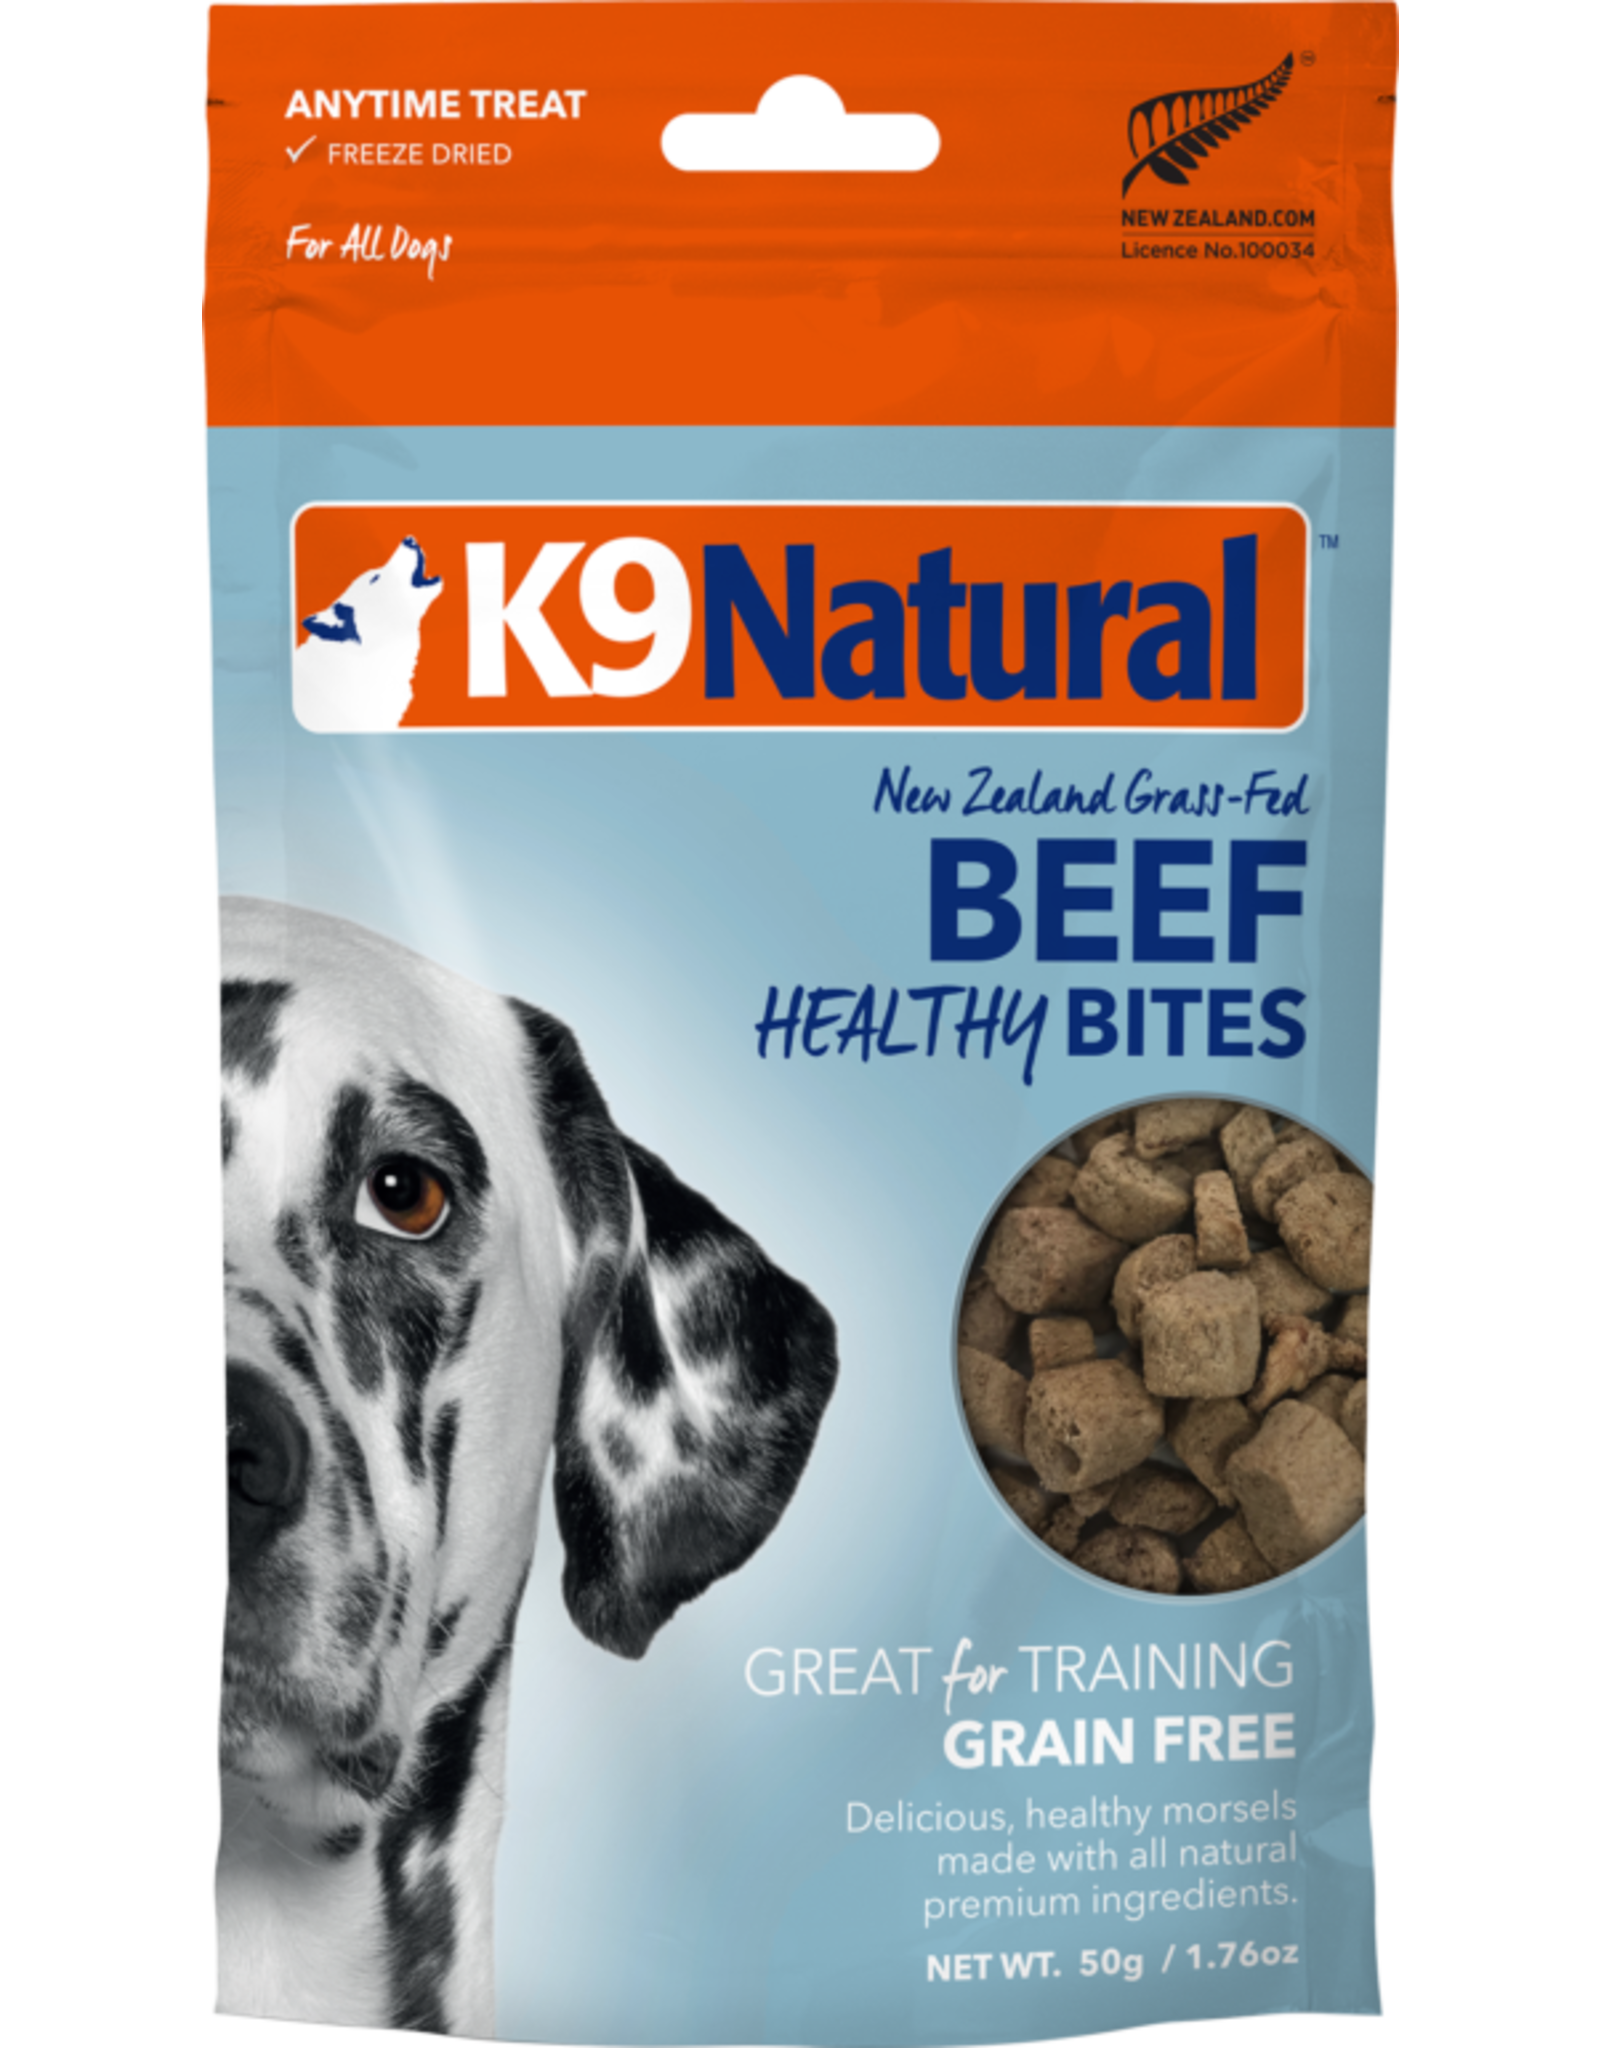 K9 Natural K9 Natural Freeze Dried Healthy Bites Beef 1.76oz